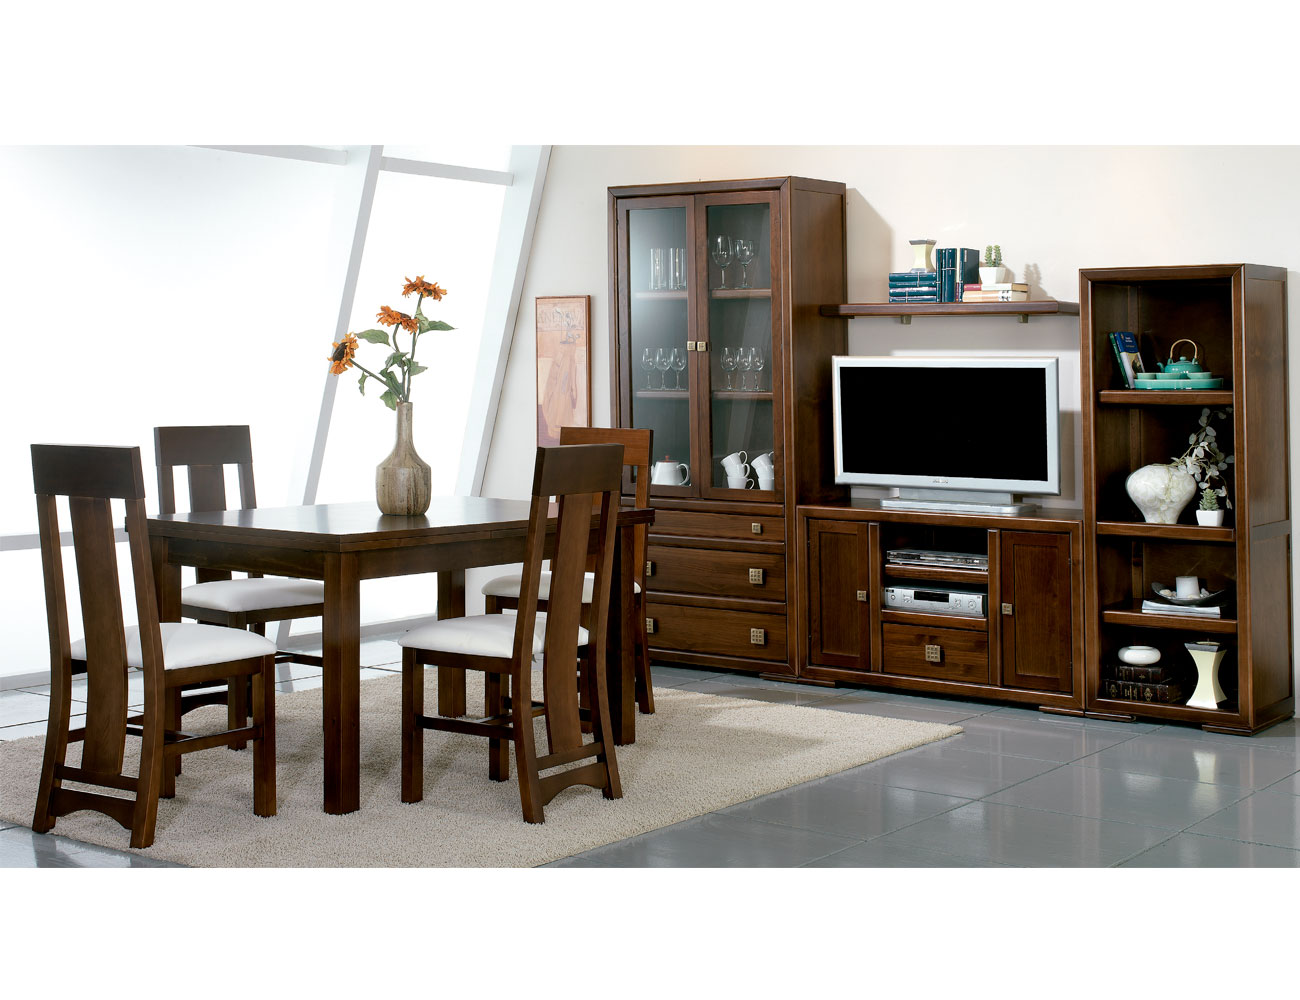 Composicion12 mueble salon comedor mesa silla4